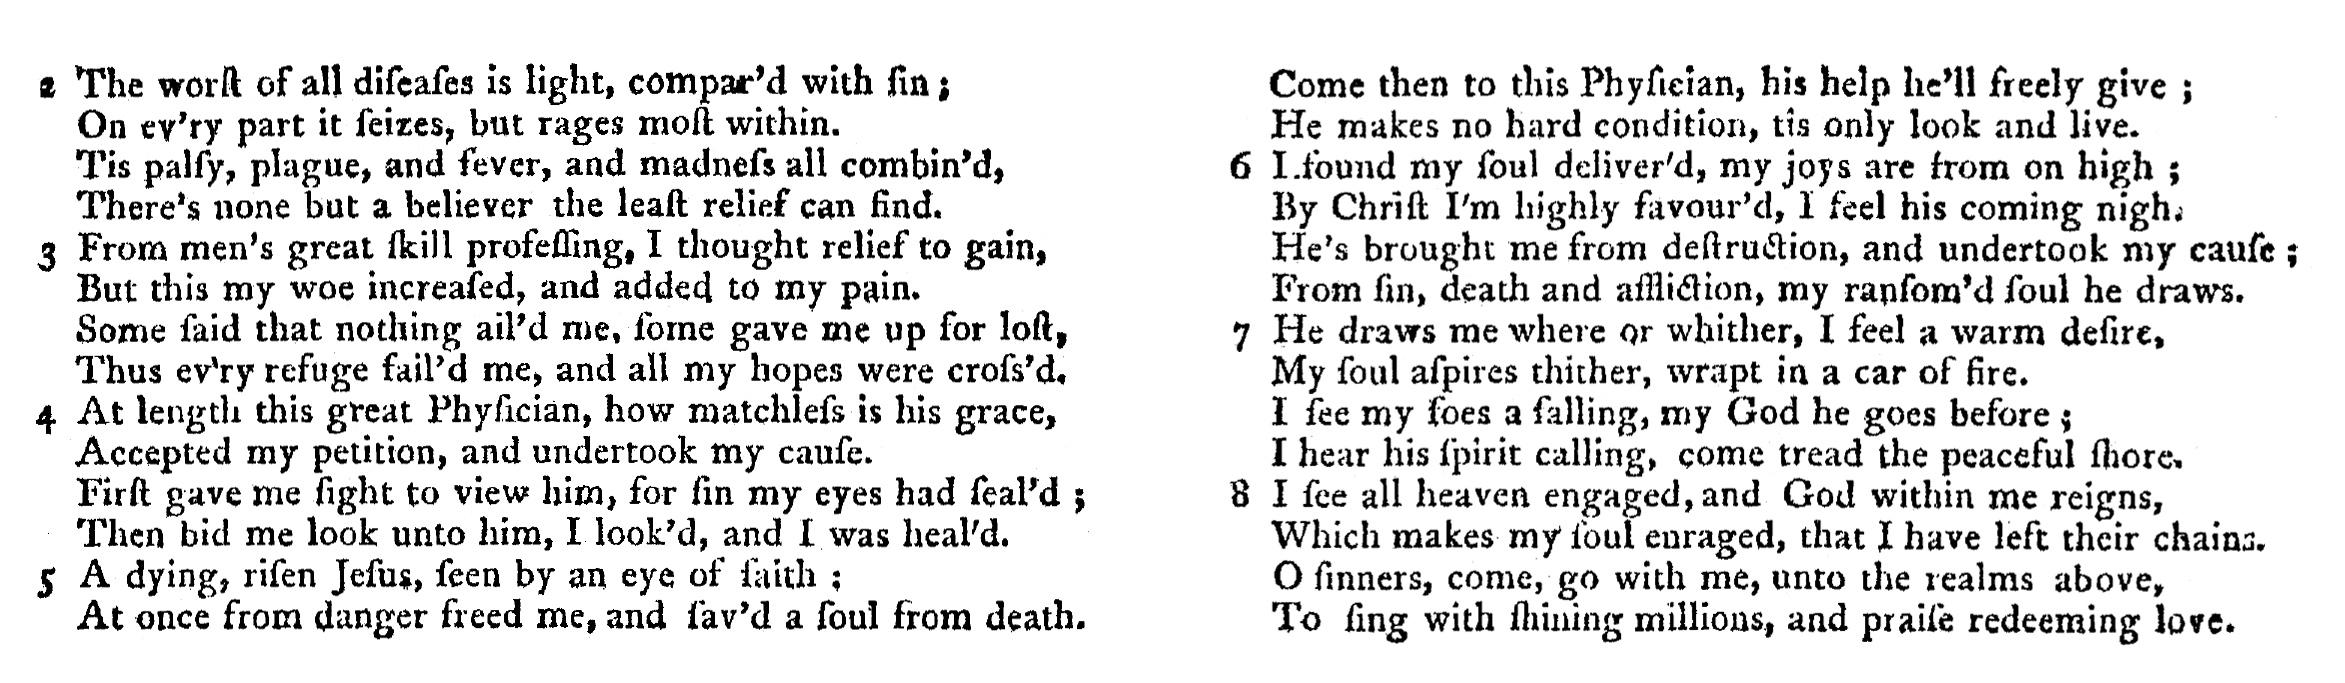 Fig. 2.  Jeremiah Ingalls,  The Christian Harmony  (Exeter, New Hampshire: Henry Ranlet, 1805).